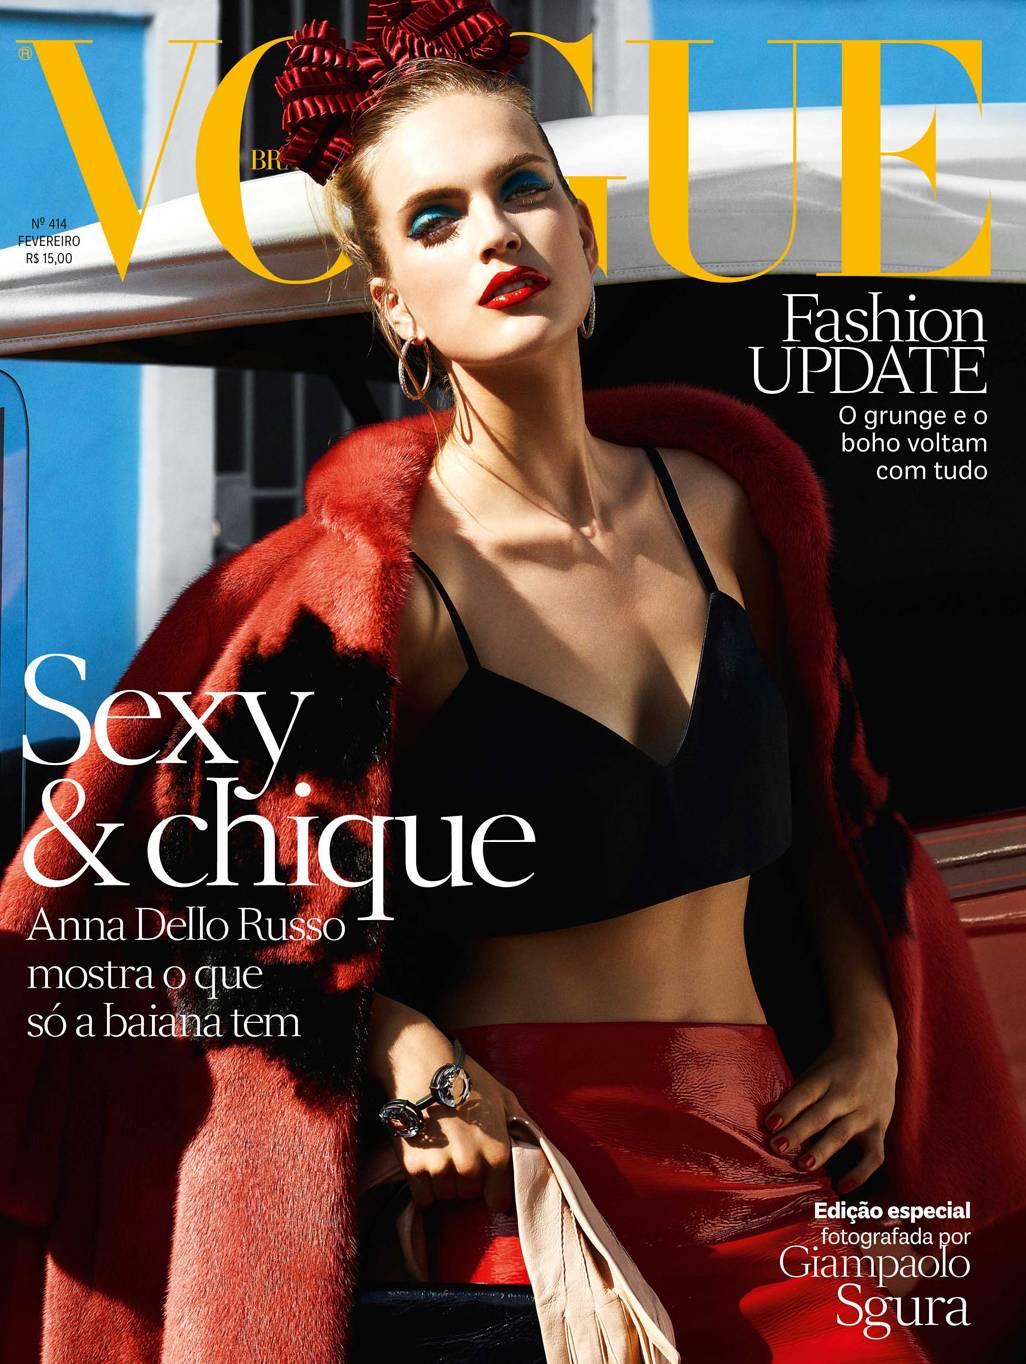 Vogue_Brasil_Janeiro2013_Mirte_Maas_ph_Giampaolo_Sgu